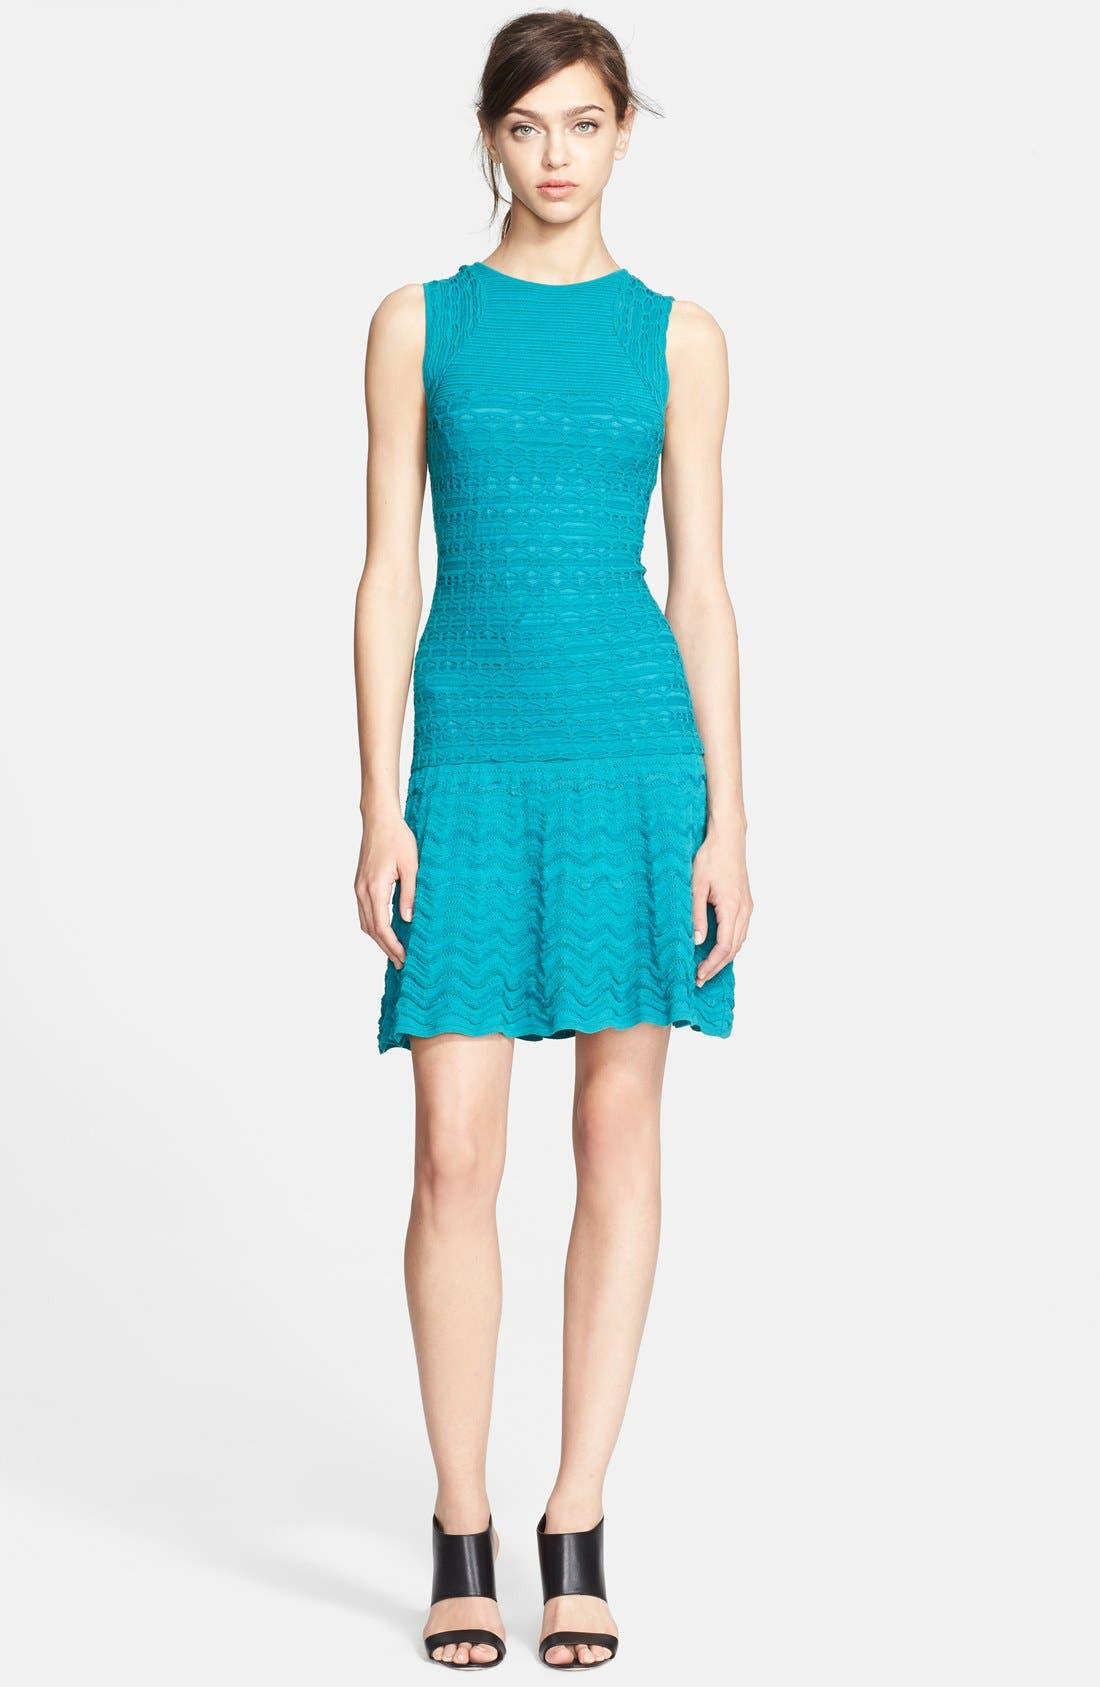 Main Image - M Missoni Sleeveless Crochet Knit Dress